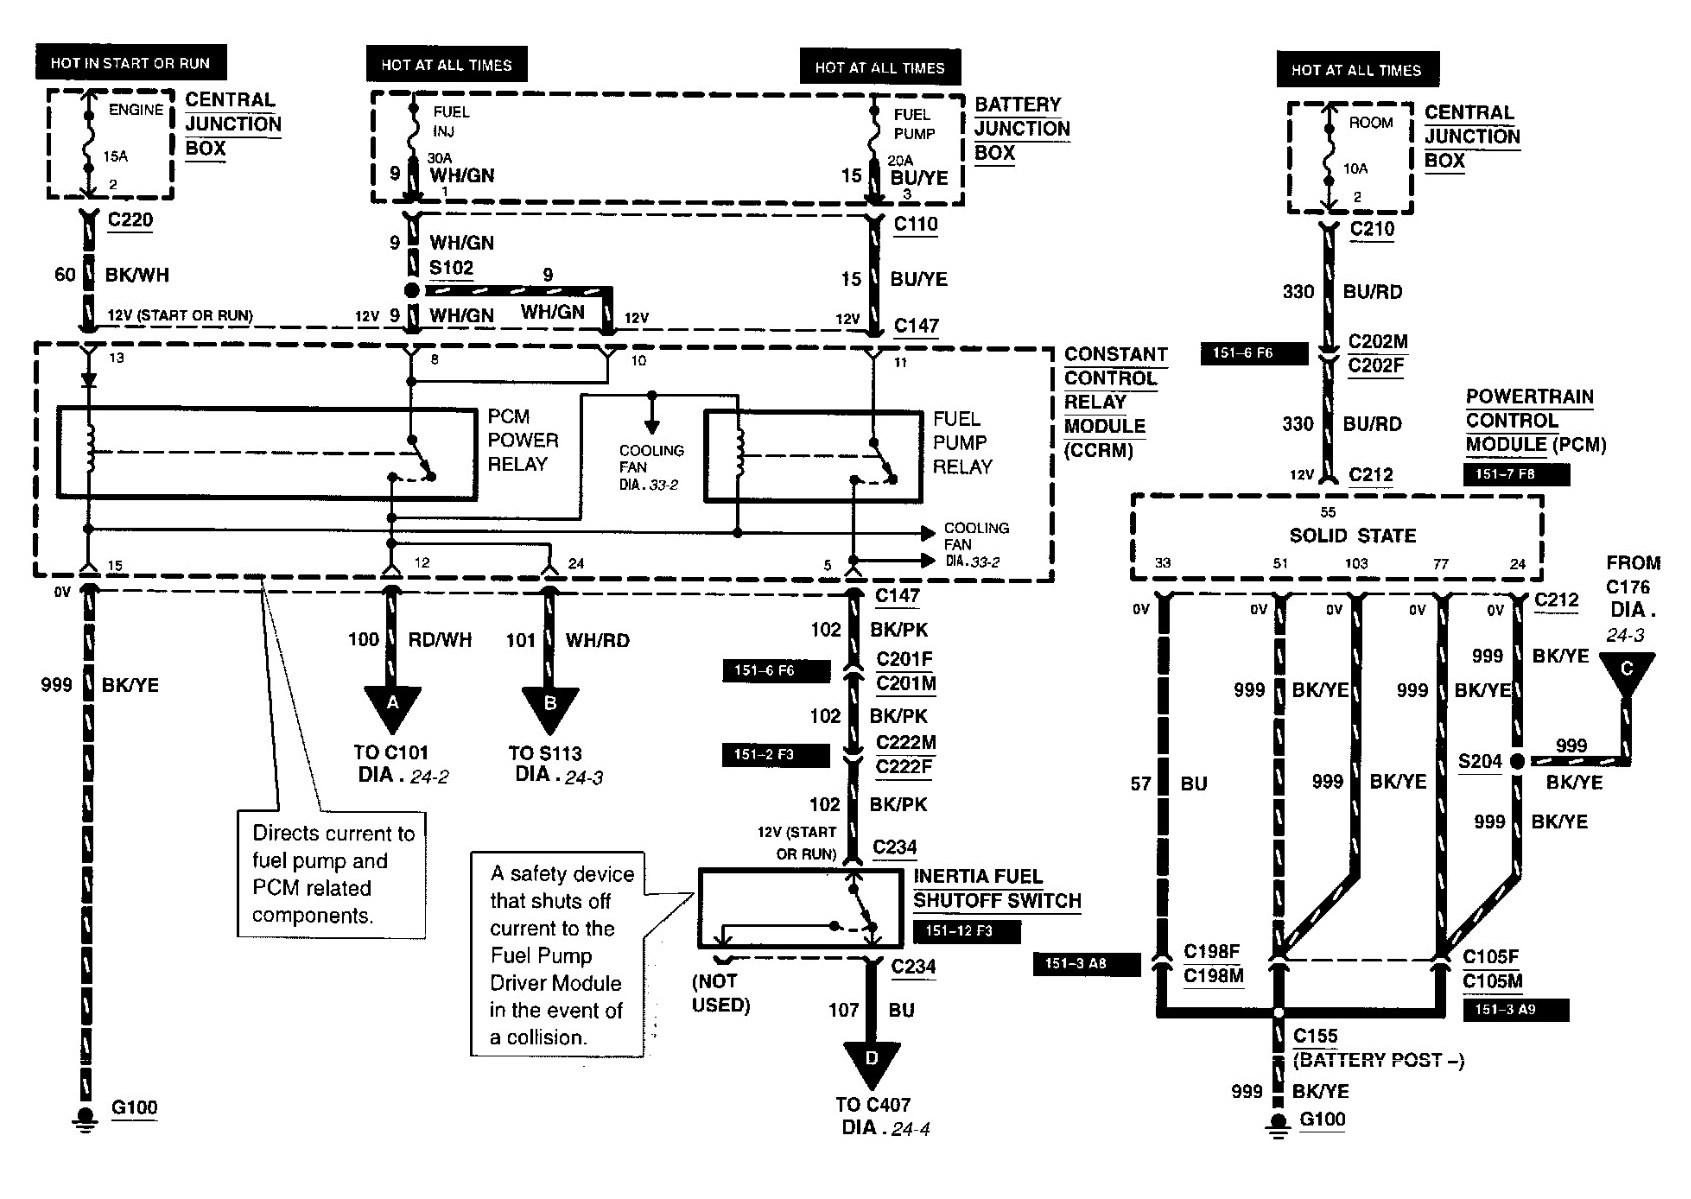 1998 ford Escort Zx2 Engine Diagram 1993 ford Escort Wiring Diagram Fresh Surprising 1998 ford Escort Of 1998 ford Escort Zx2 Engine Diagram